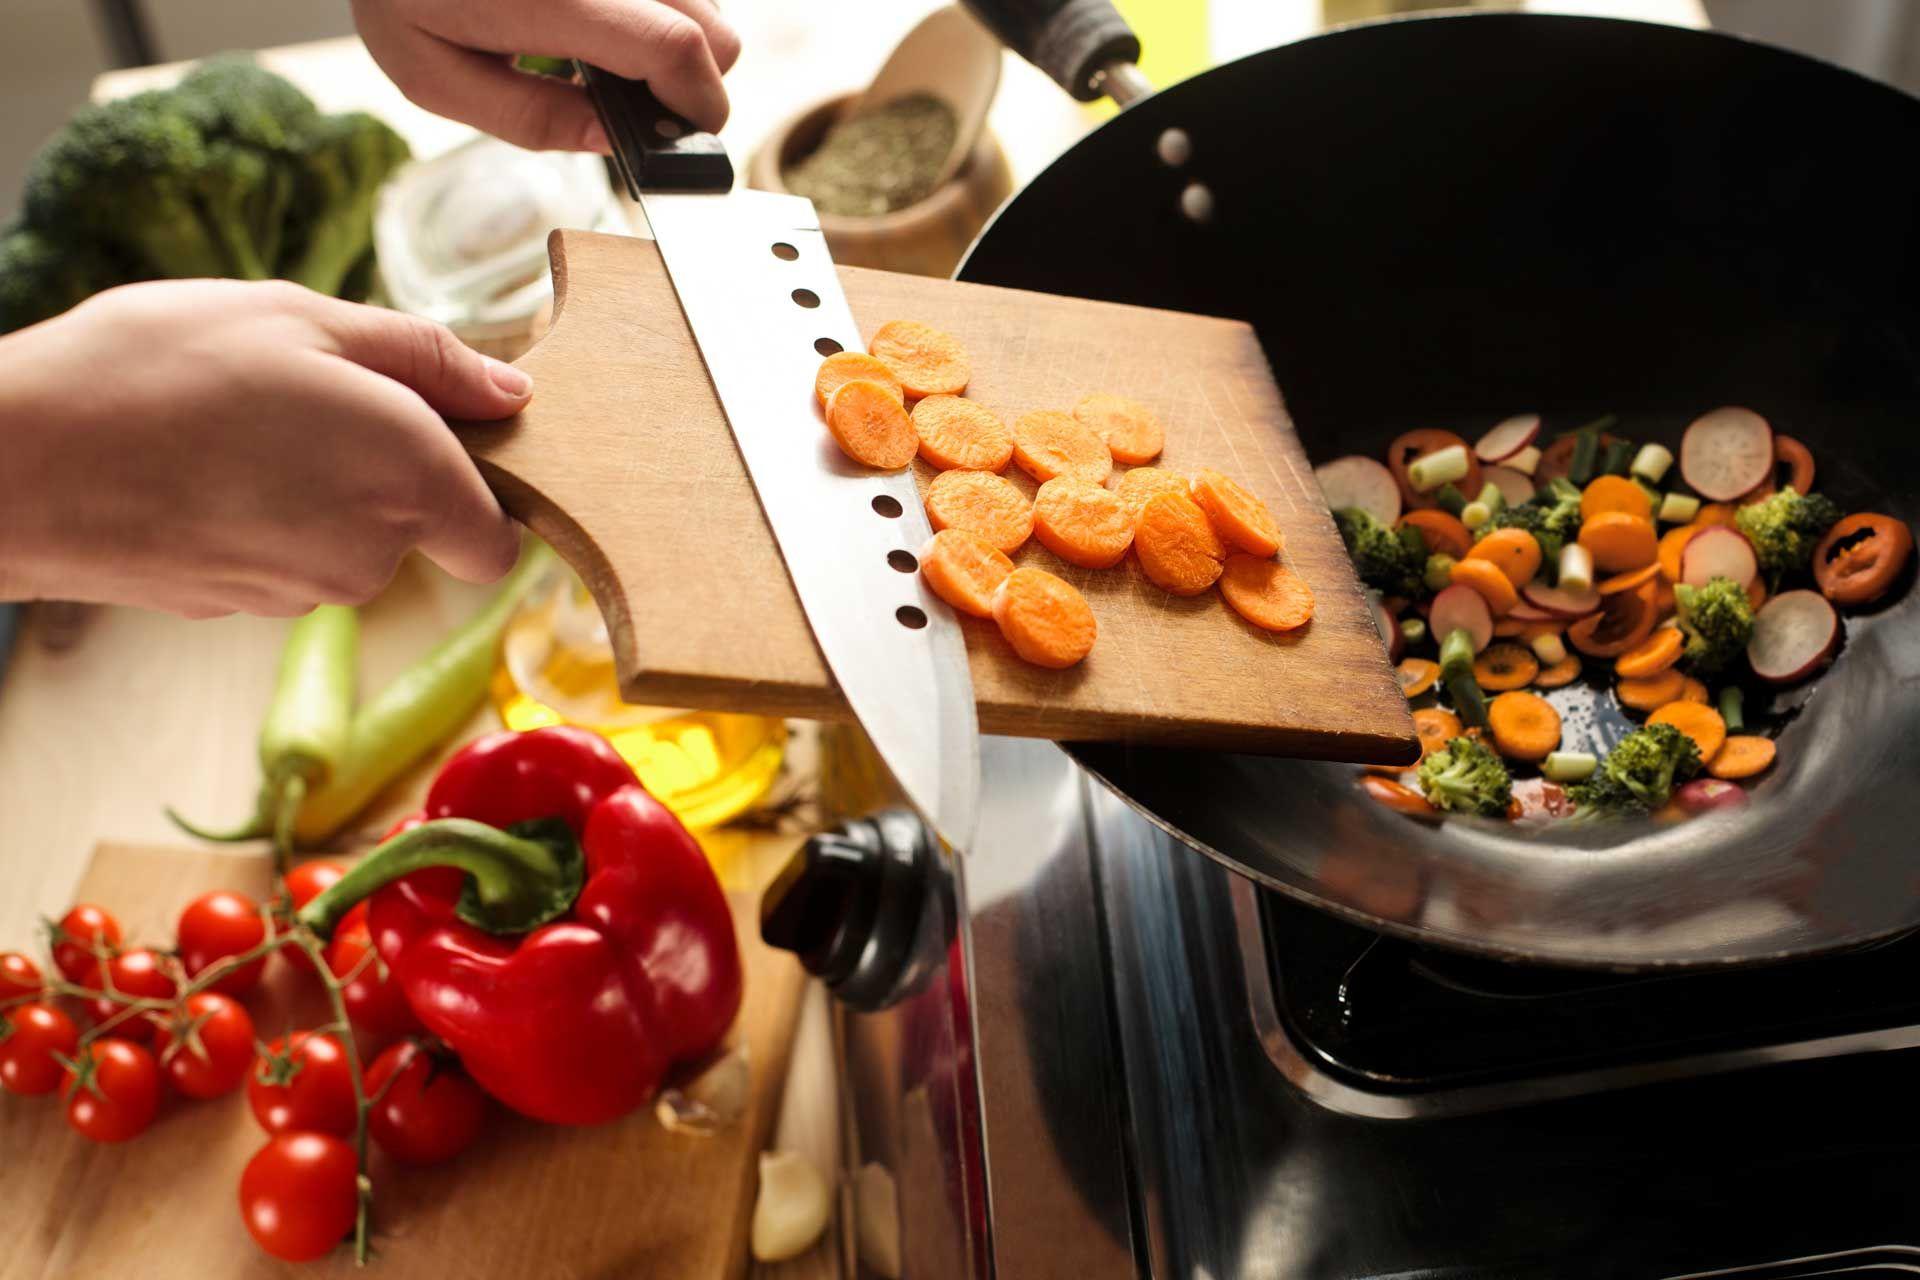 marathos: φρέσκα υλικά, αυθεντικές συνταγές, στην πόρτα σας με ένα click